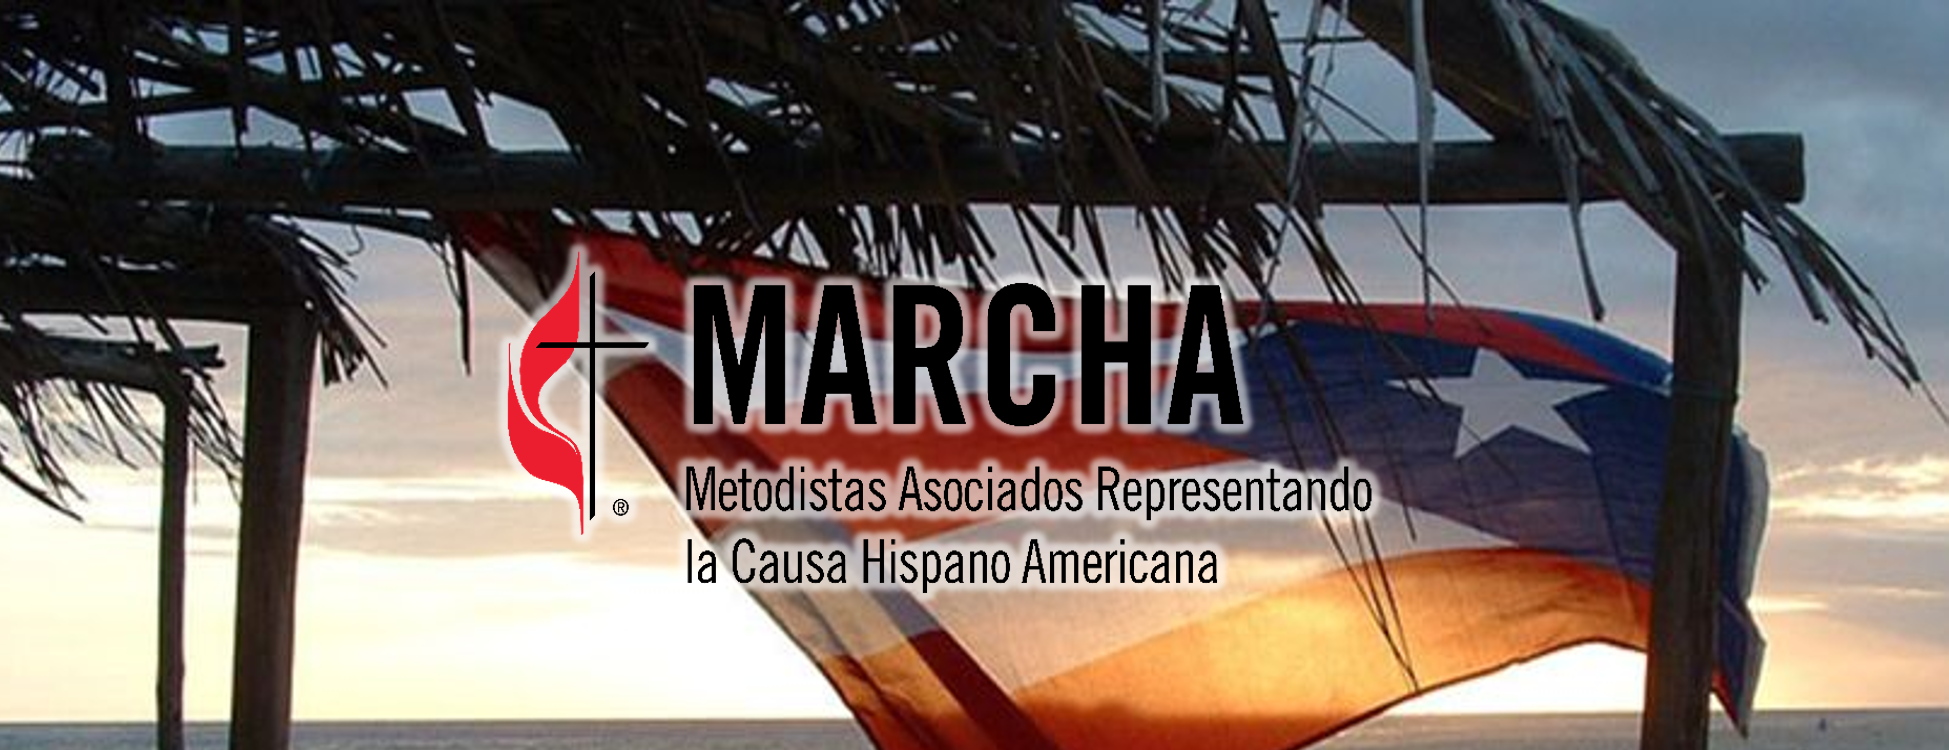 Puerto rico hispanico latino dating